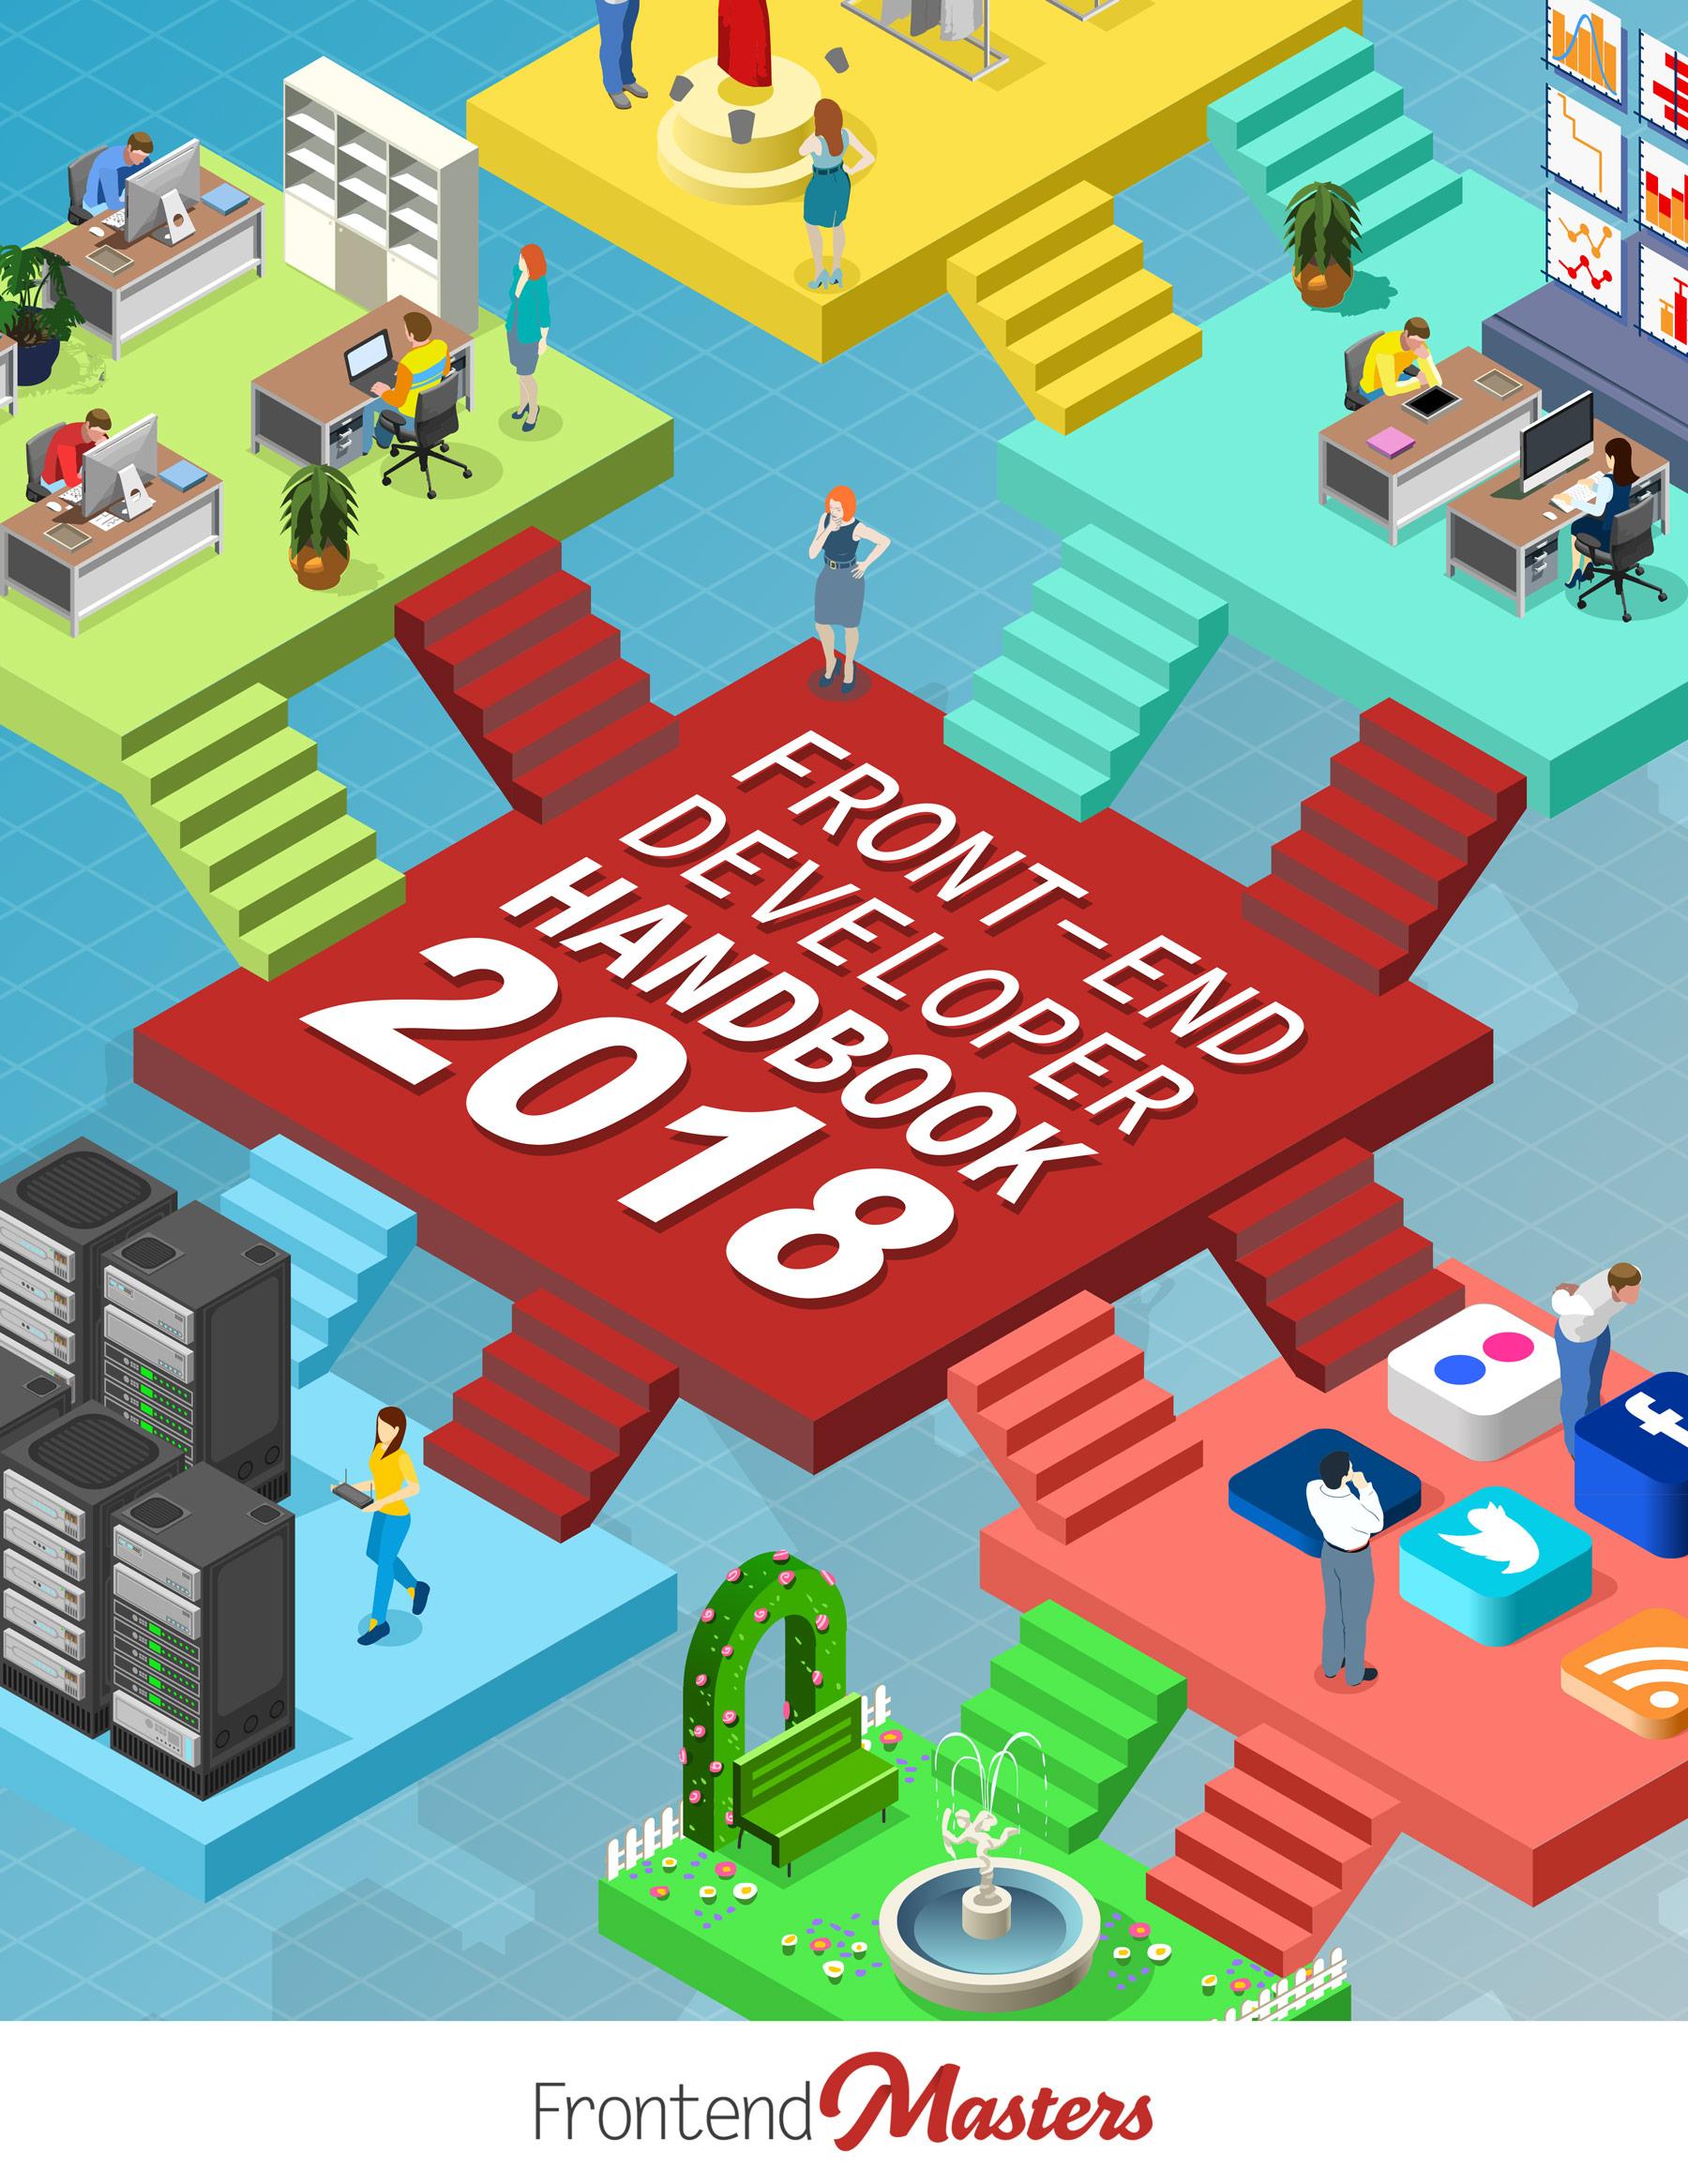 GitHub - FrontendMasters/front-end-handbook-2018: 2018